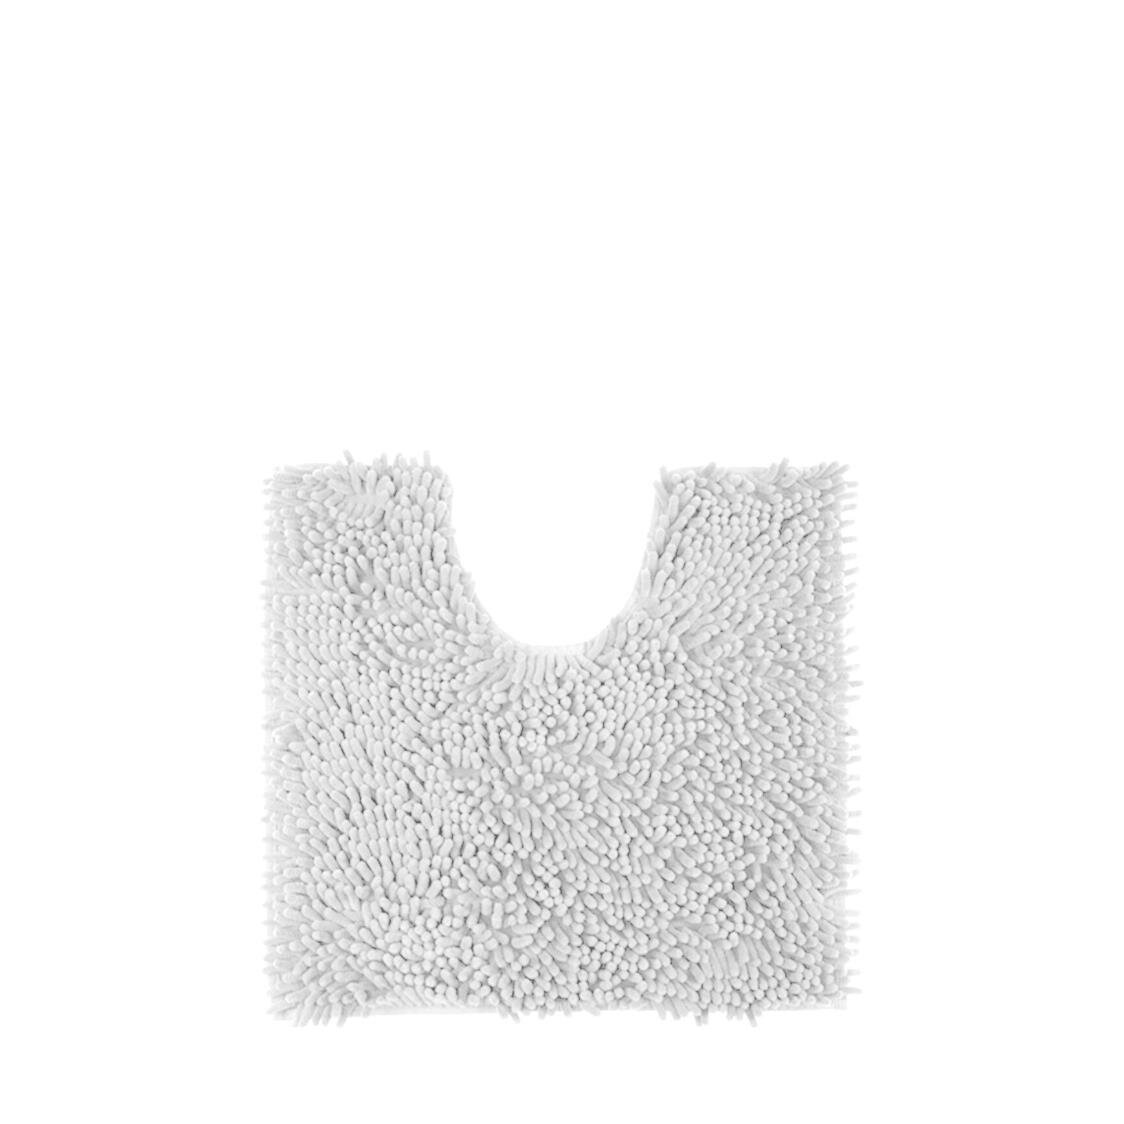 Charles Millen 100 Microfibre Mat with styrene-butadiene Antislip Backing Moppy CONTOUR MFM-1 Bleached White